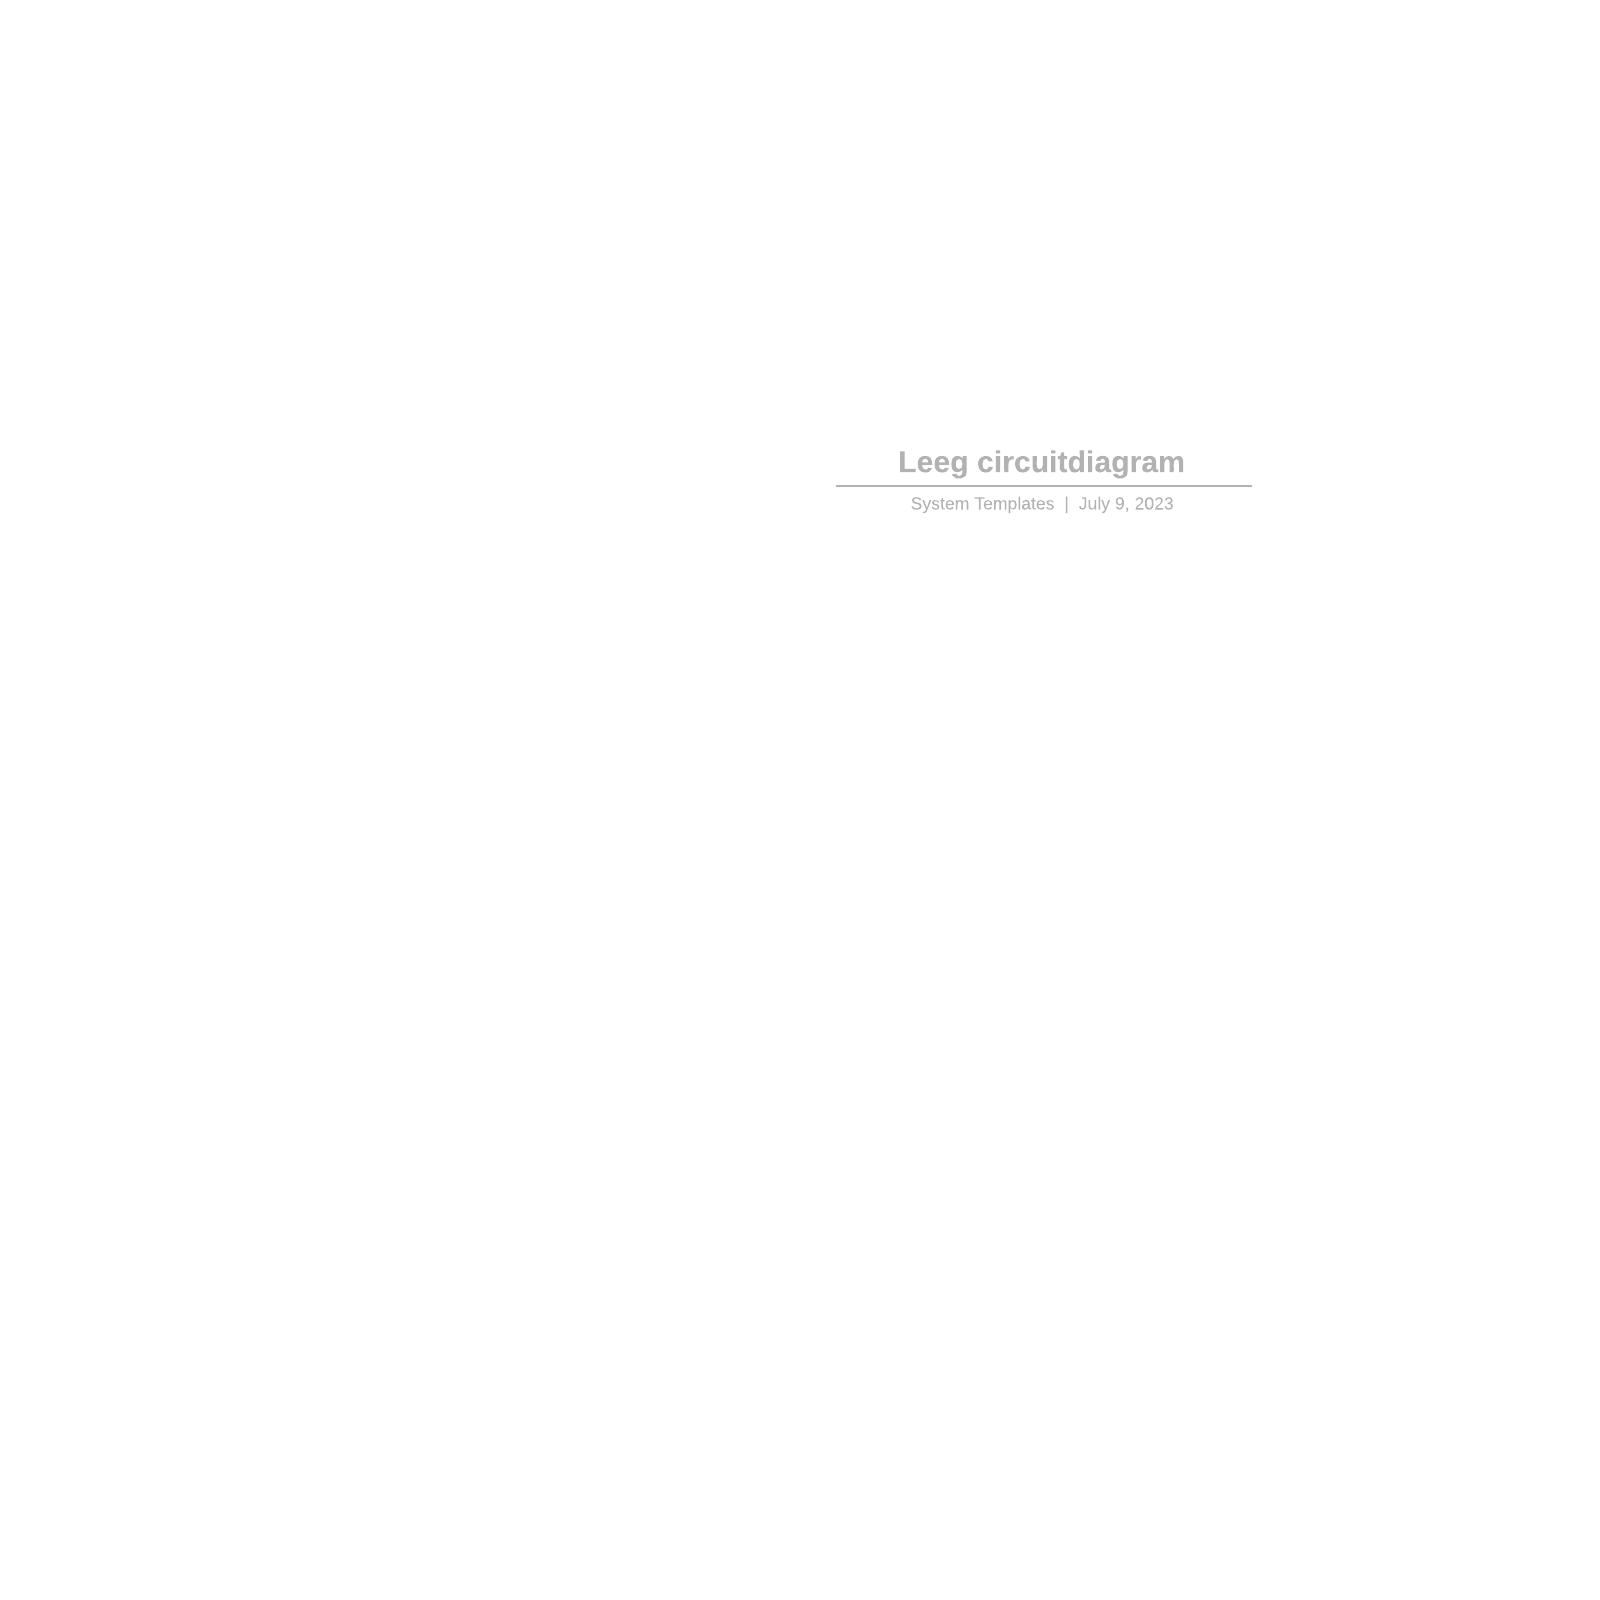 Leeg circuitdiagram